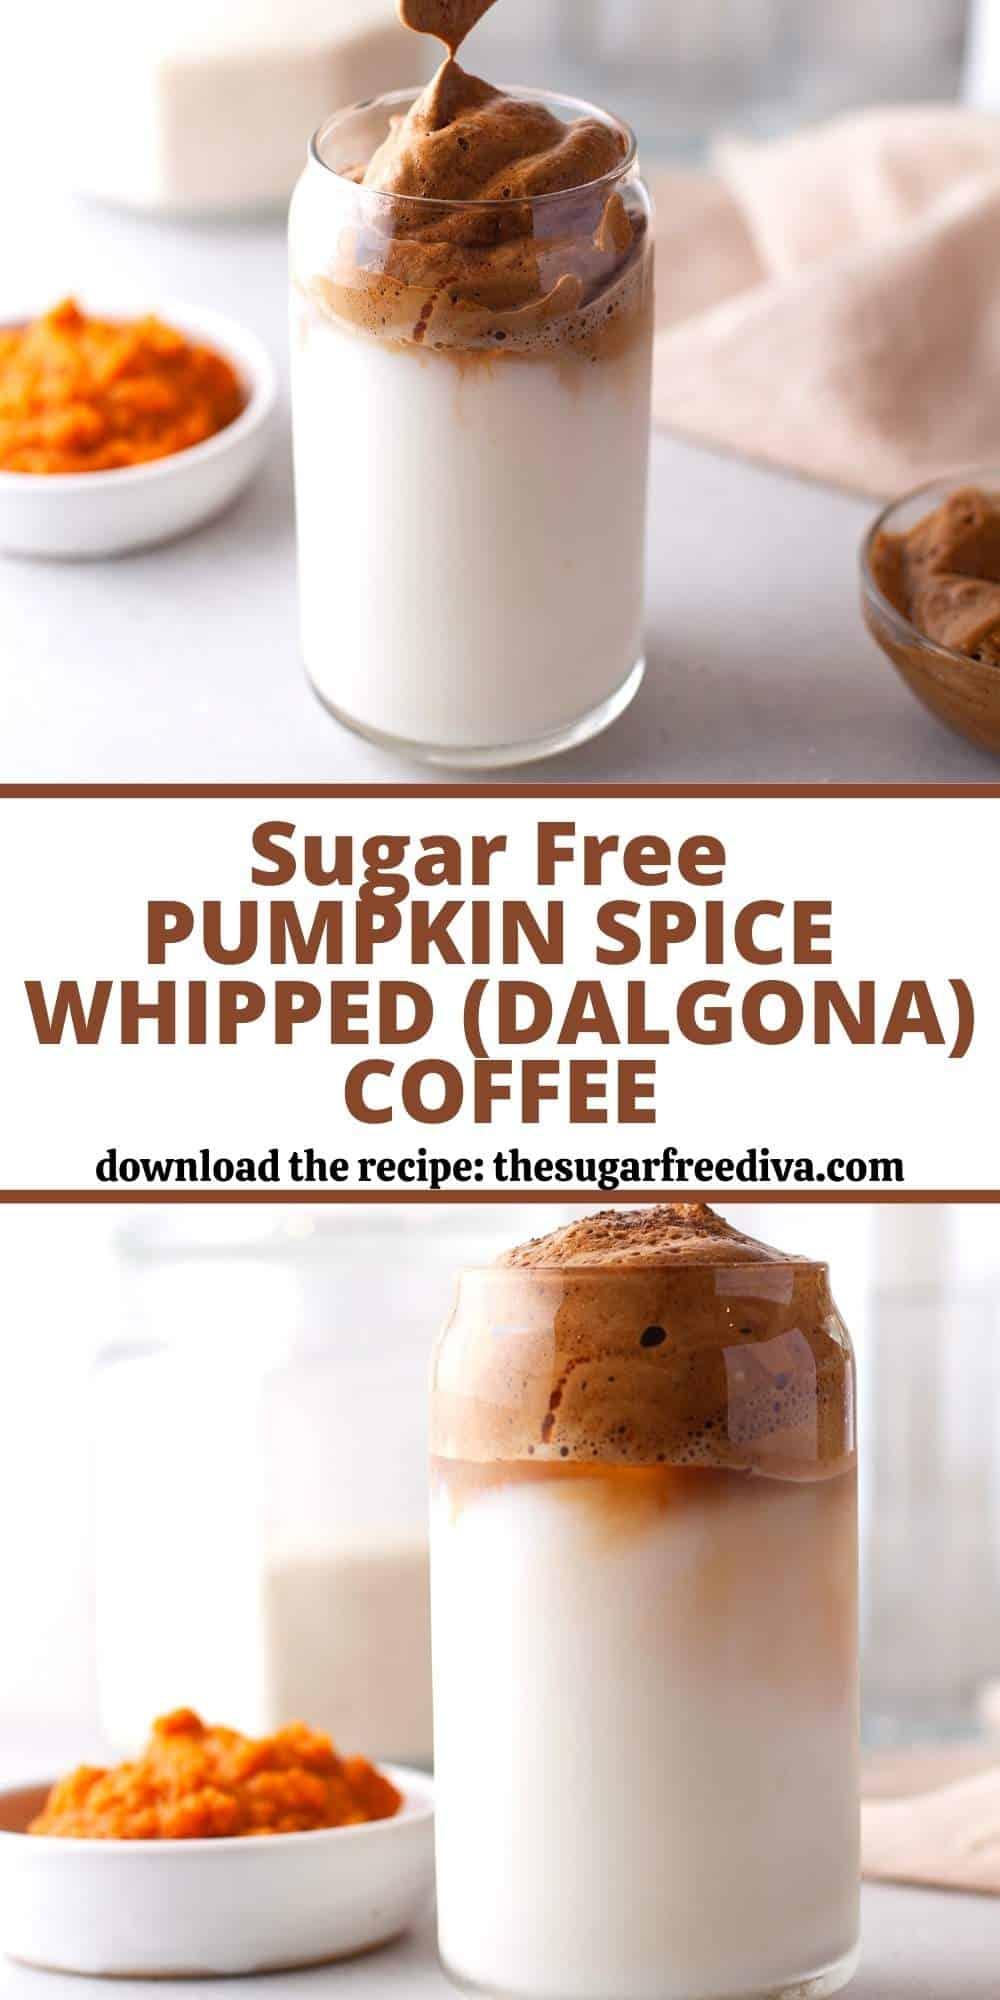 Sugar Free Pumpkin Spice Dalgona Whipped Coffee